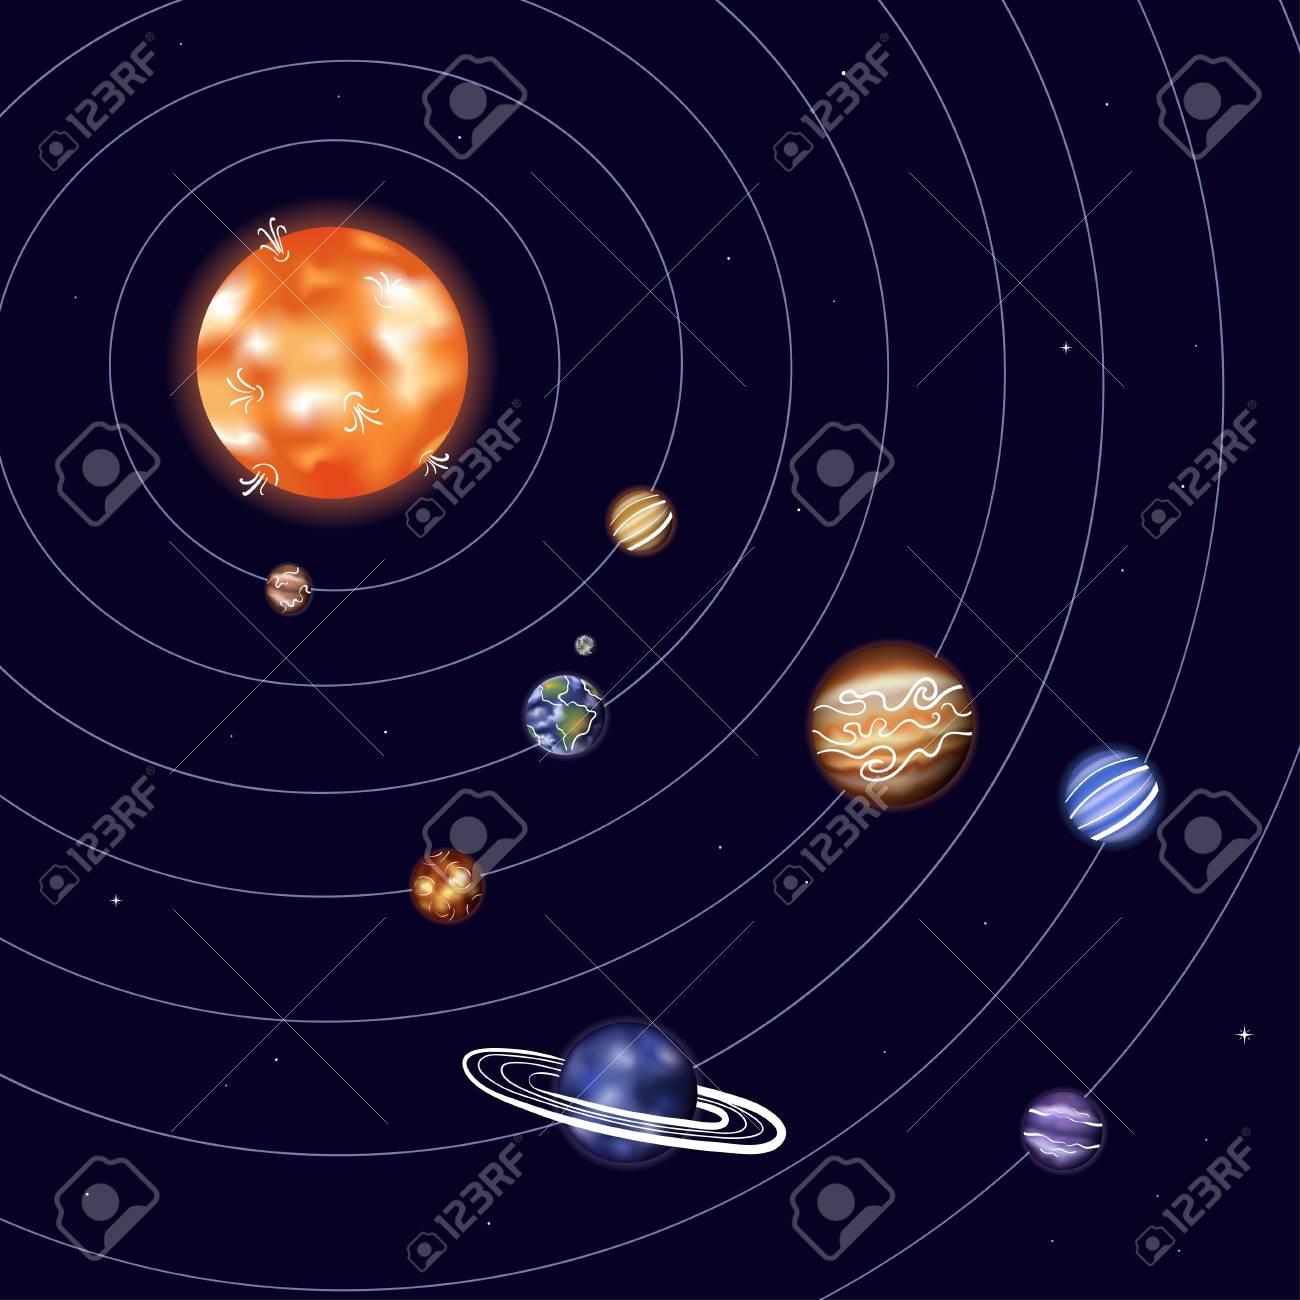 Vector illustration of solar system with Sun, Mercury, Venus,